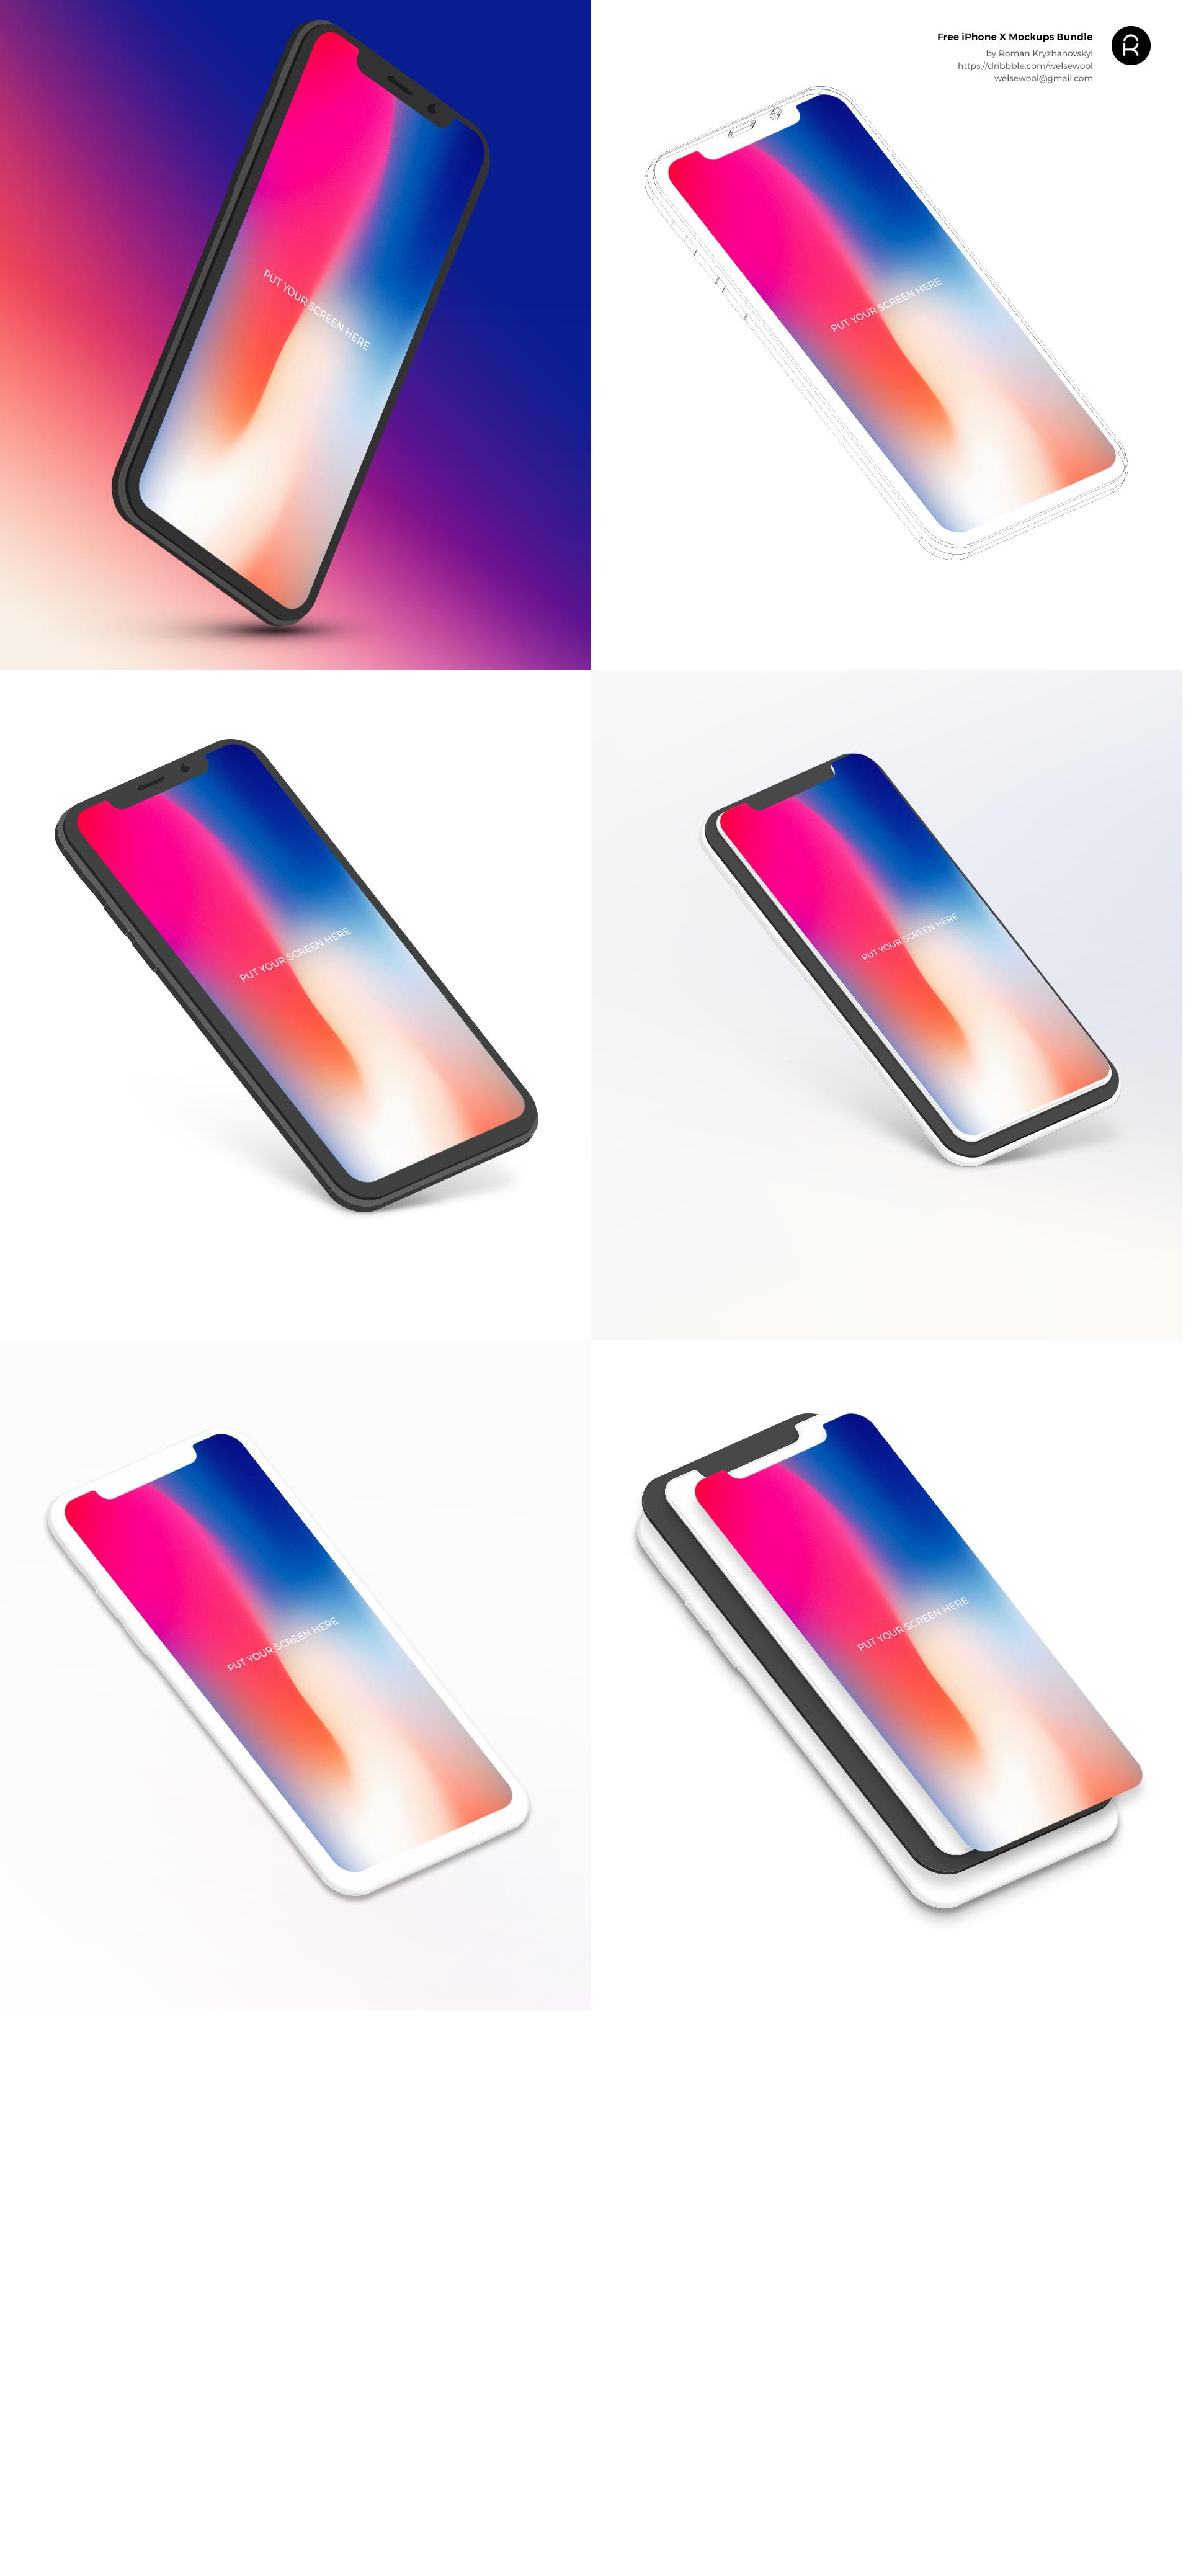 Iphone x mockups bundle by roman kryzhanovskyi